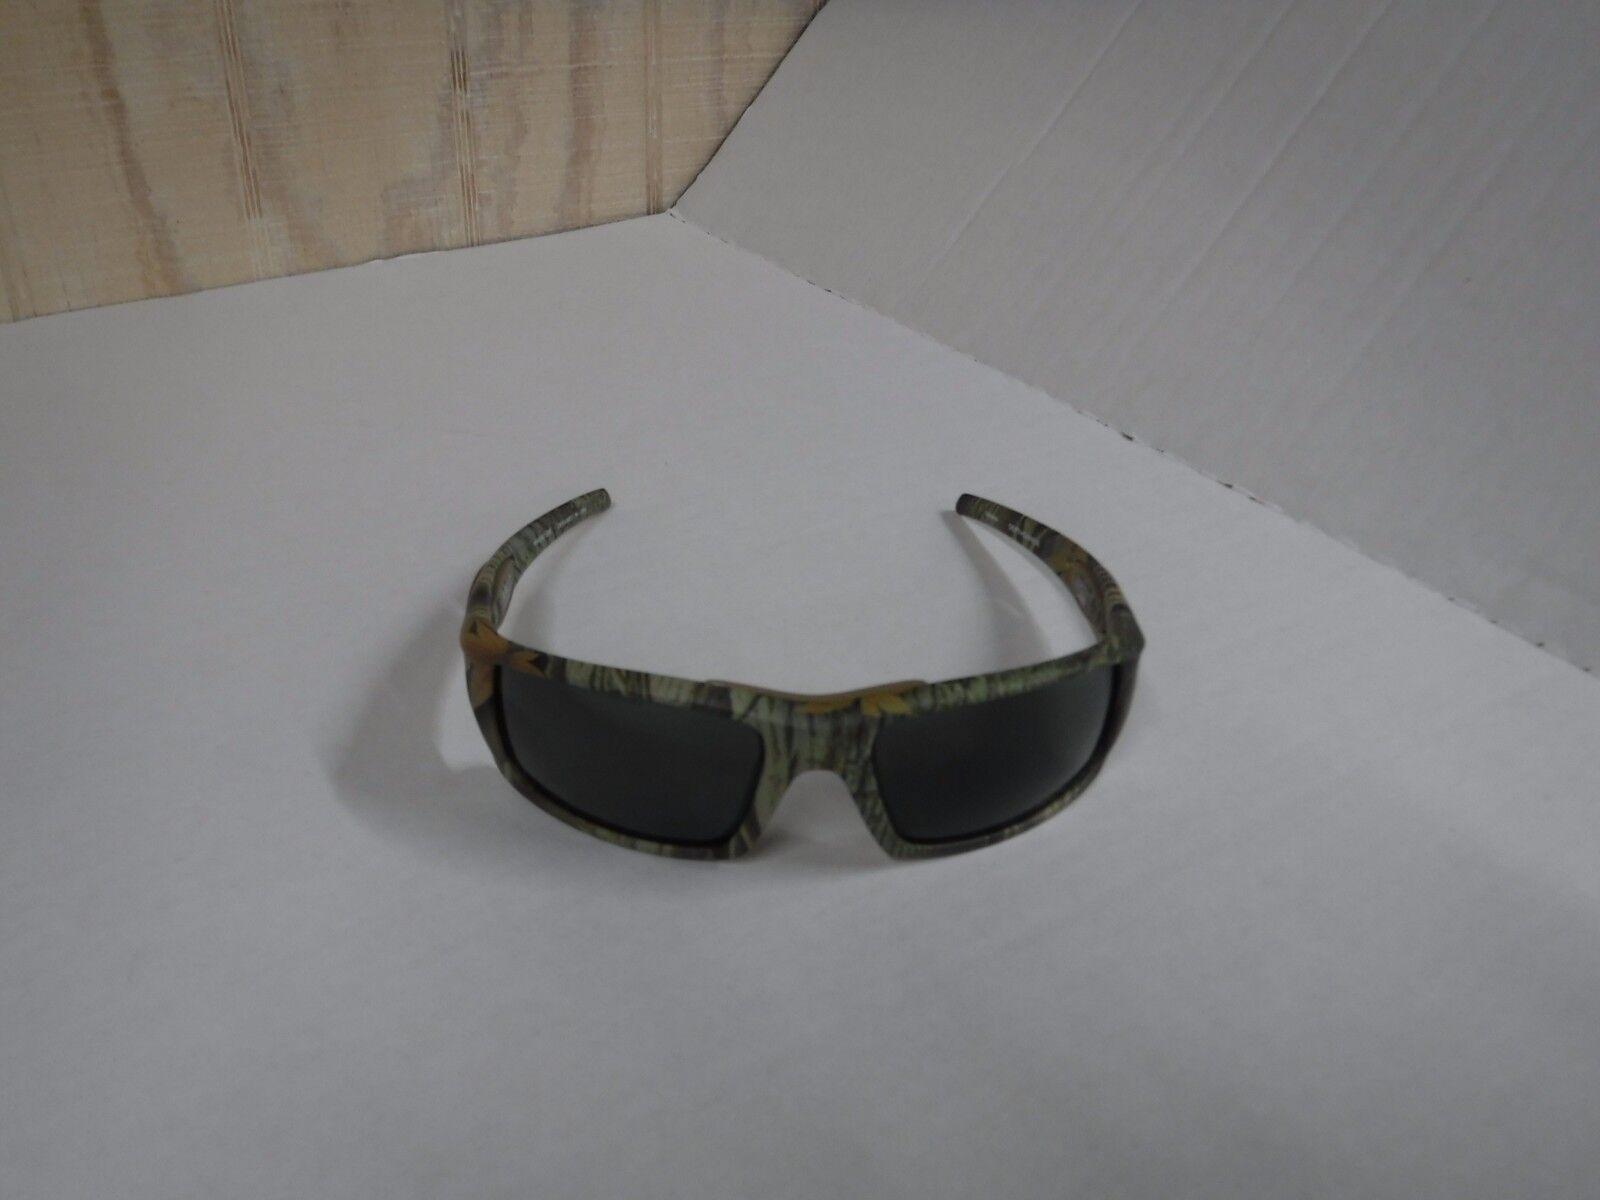 Amphibia Safety Sunglasses  Depthcharge Camo  Vapor Lens (SHATTERPROOF)  6381